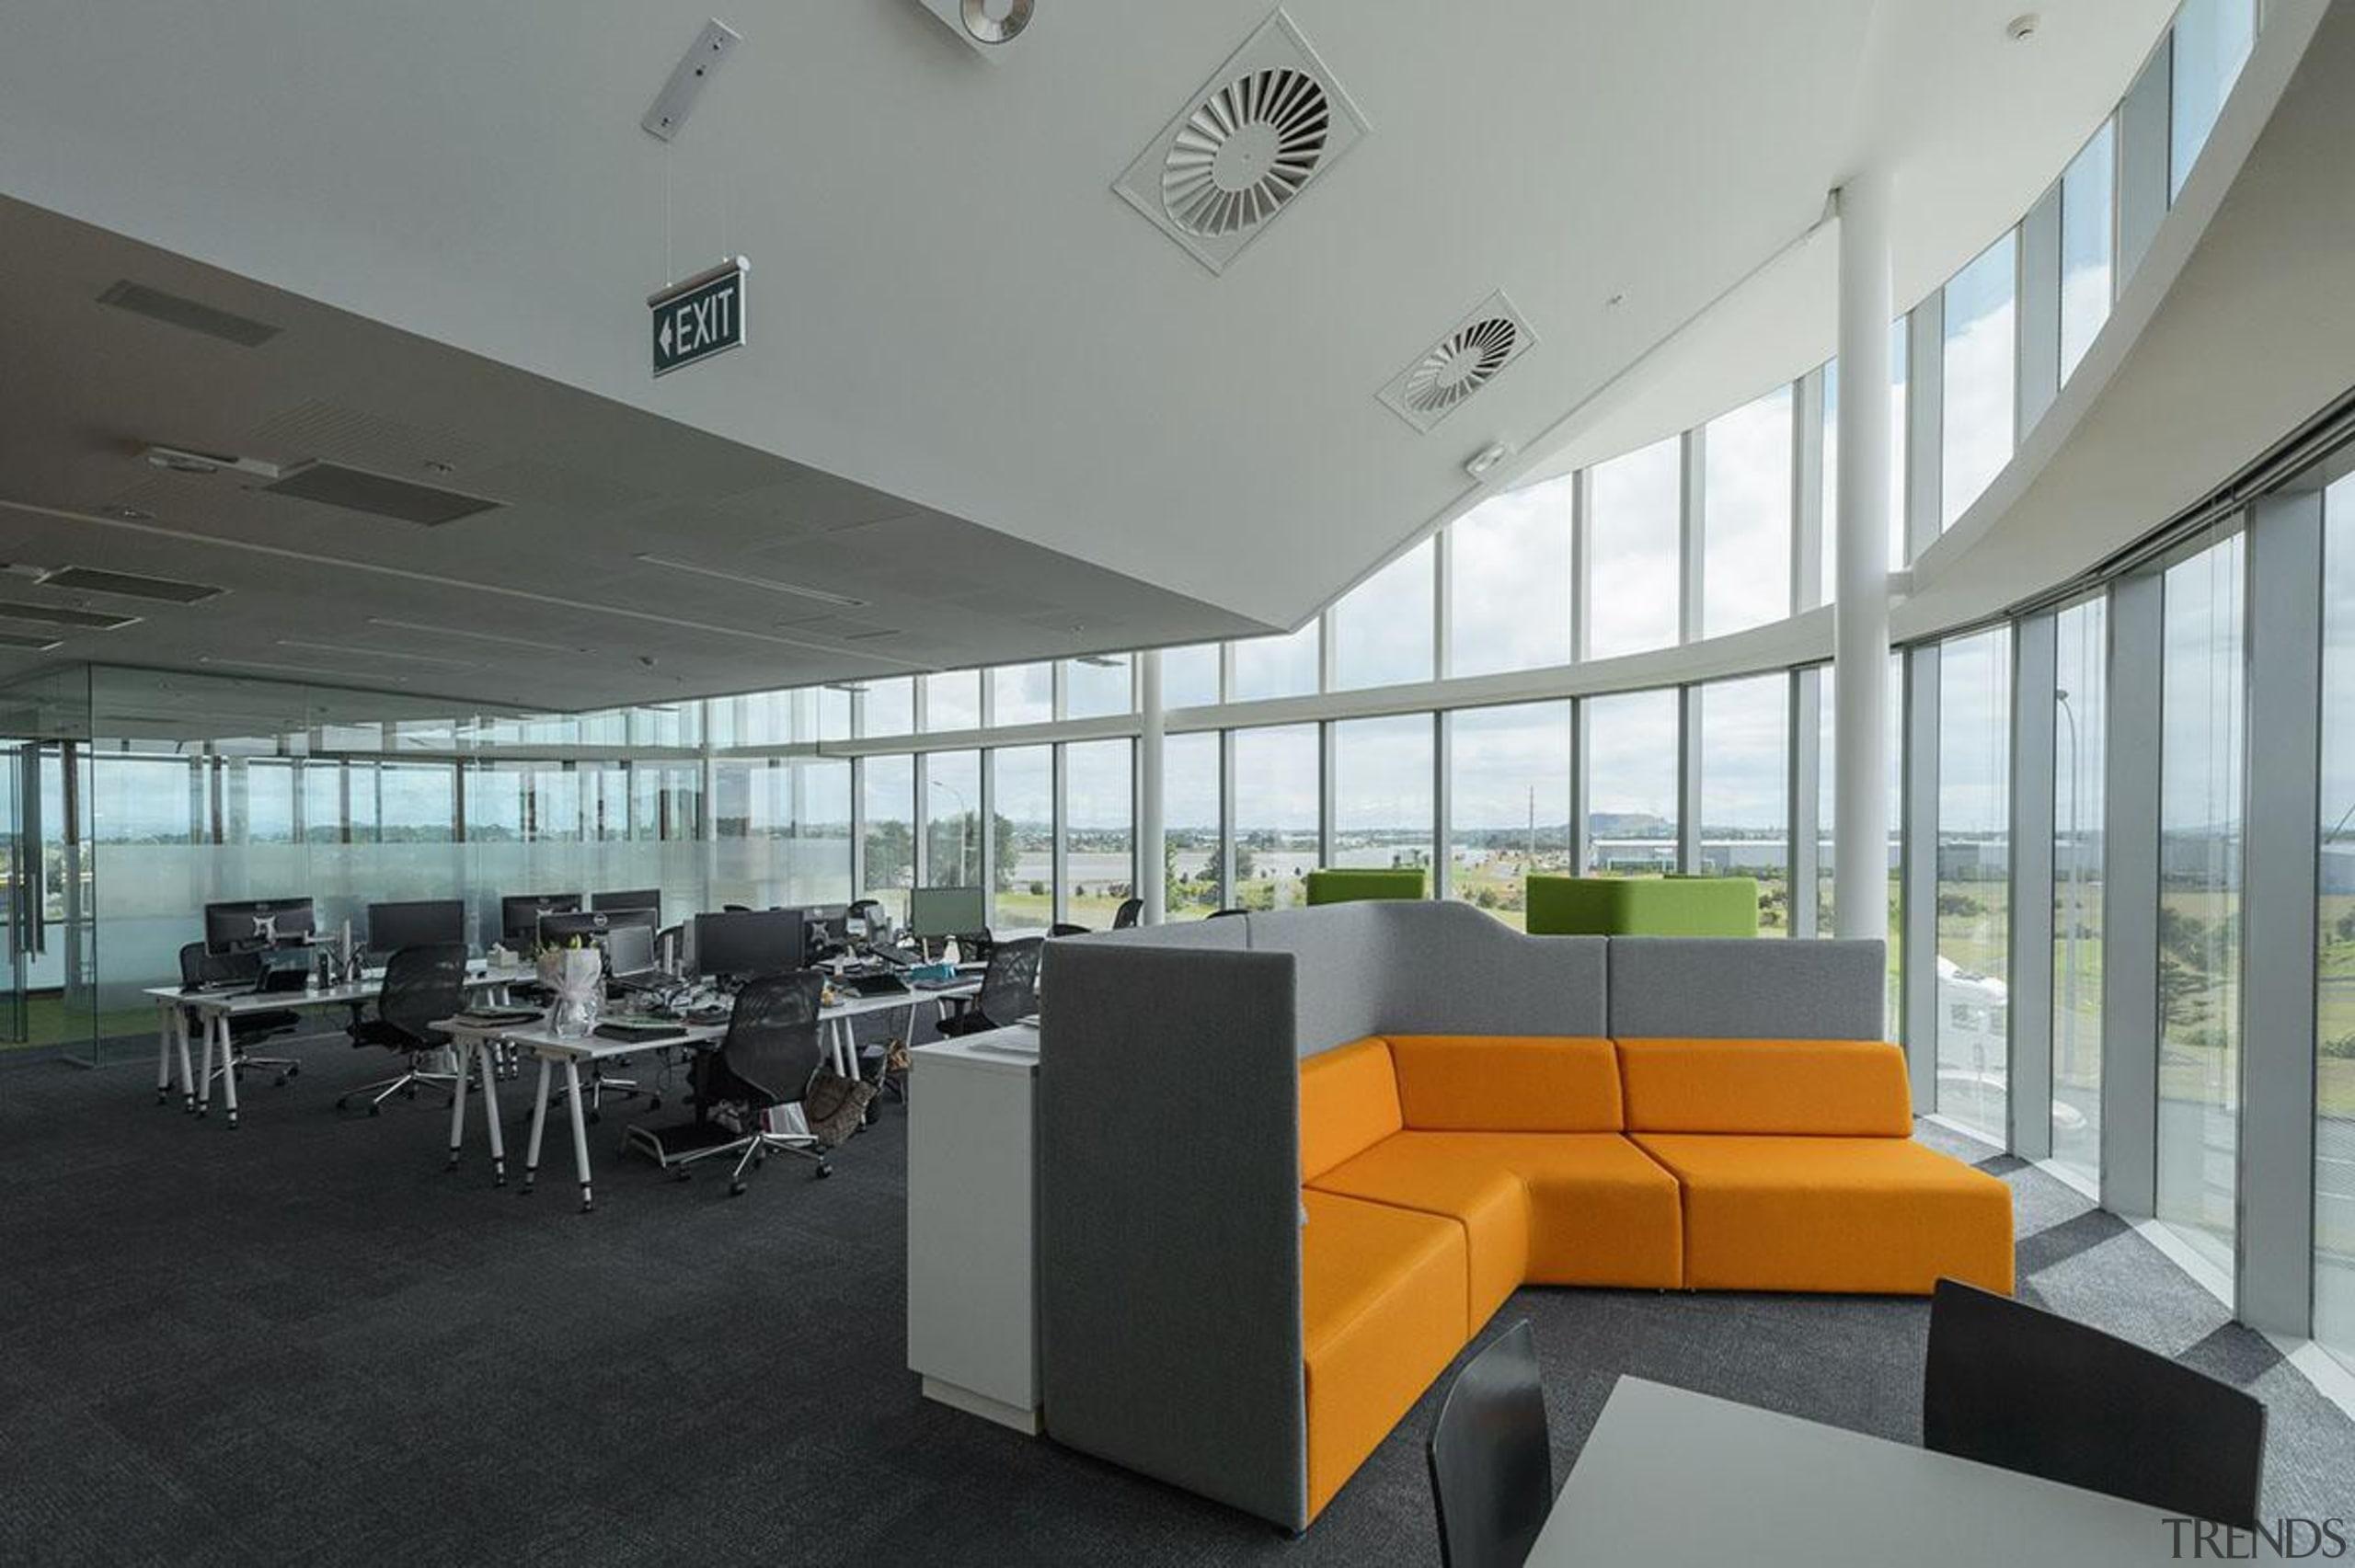 MERIT WINNERThe Crossing Highbrooks Business Park (4 of architecture, ceiling, daylighting, interior design, office, gray, black